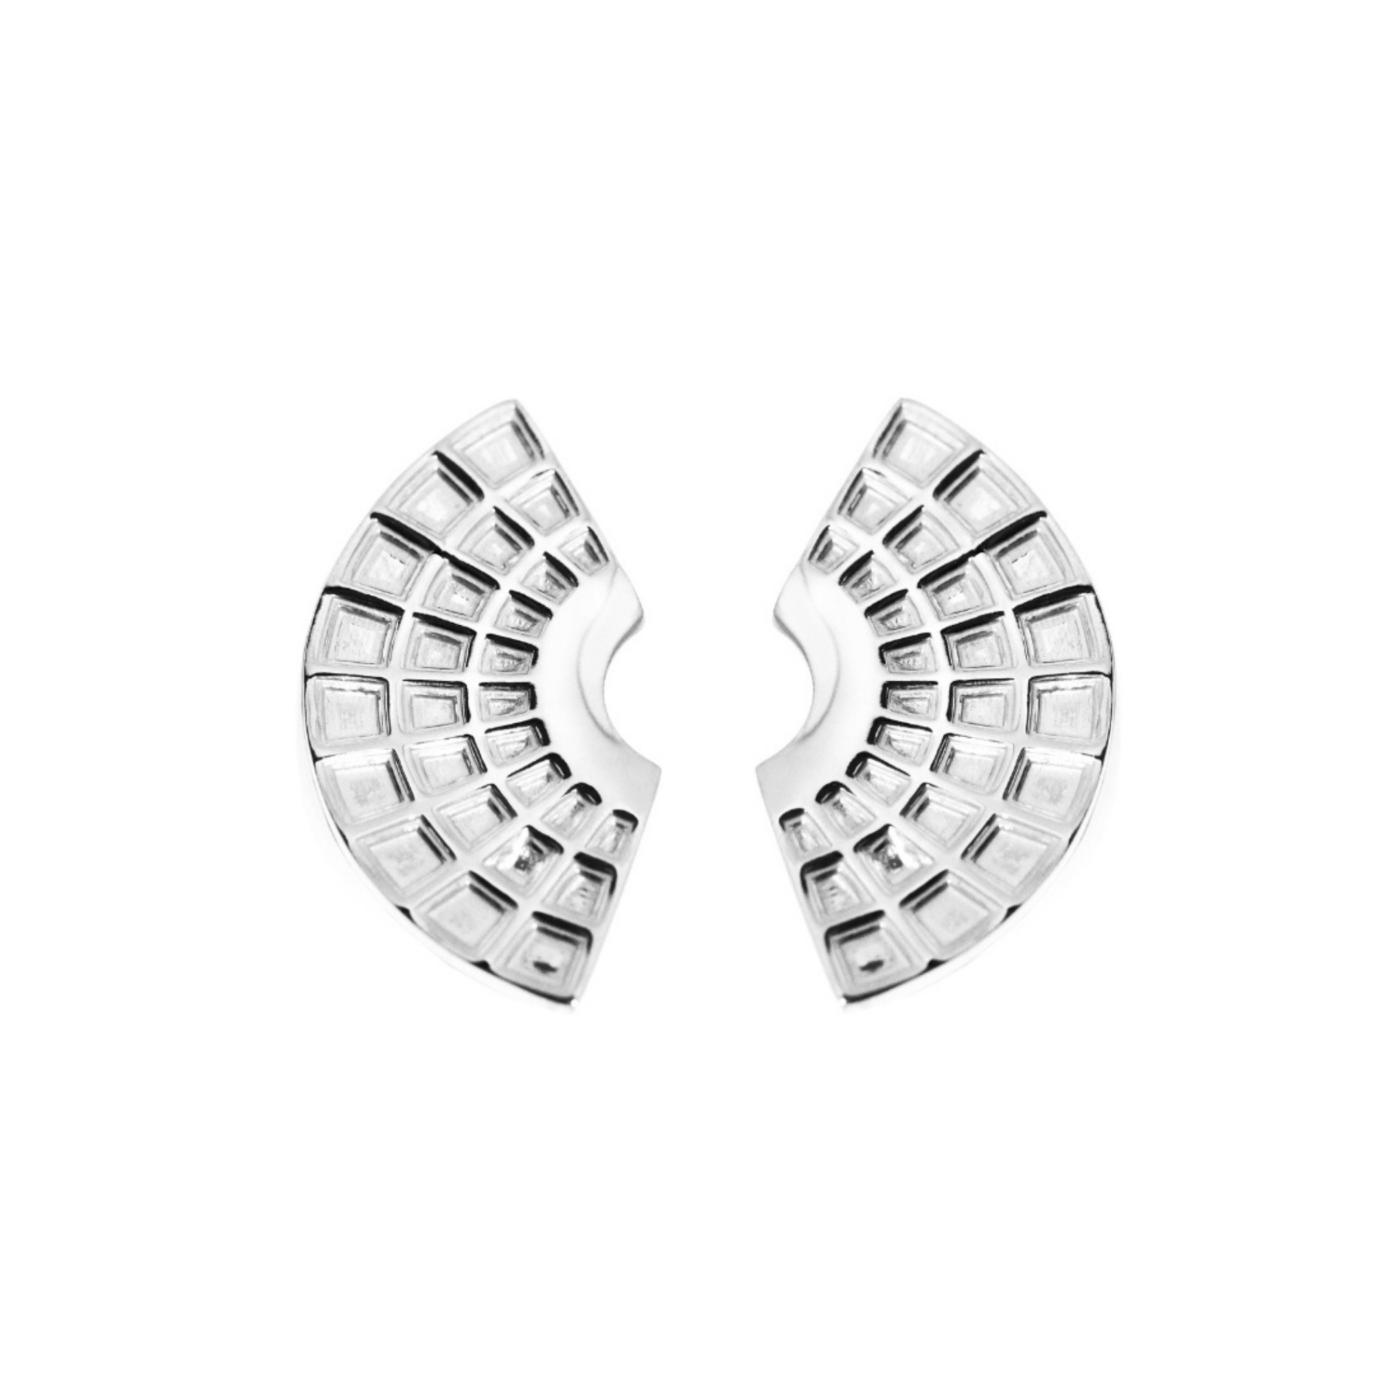 Pantheon Earrings 925 Sterling Silver